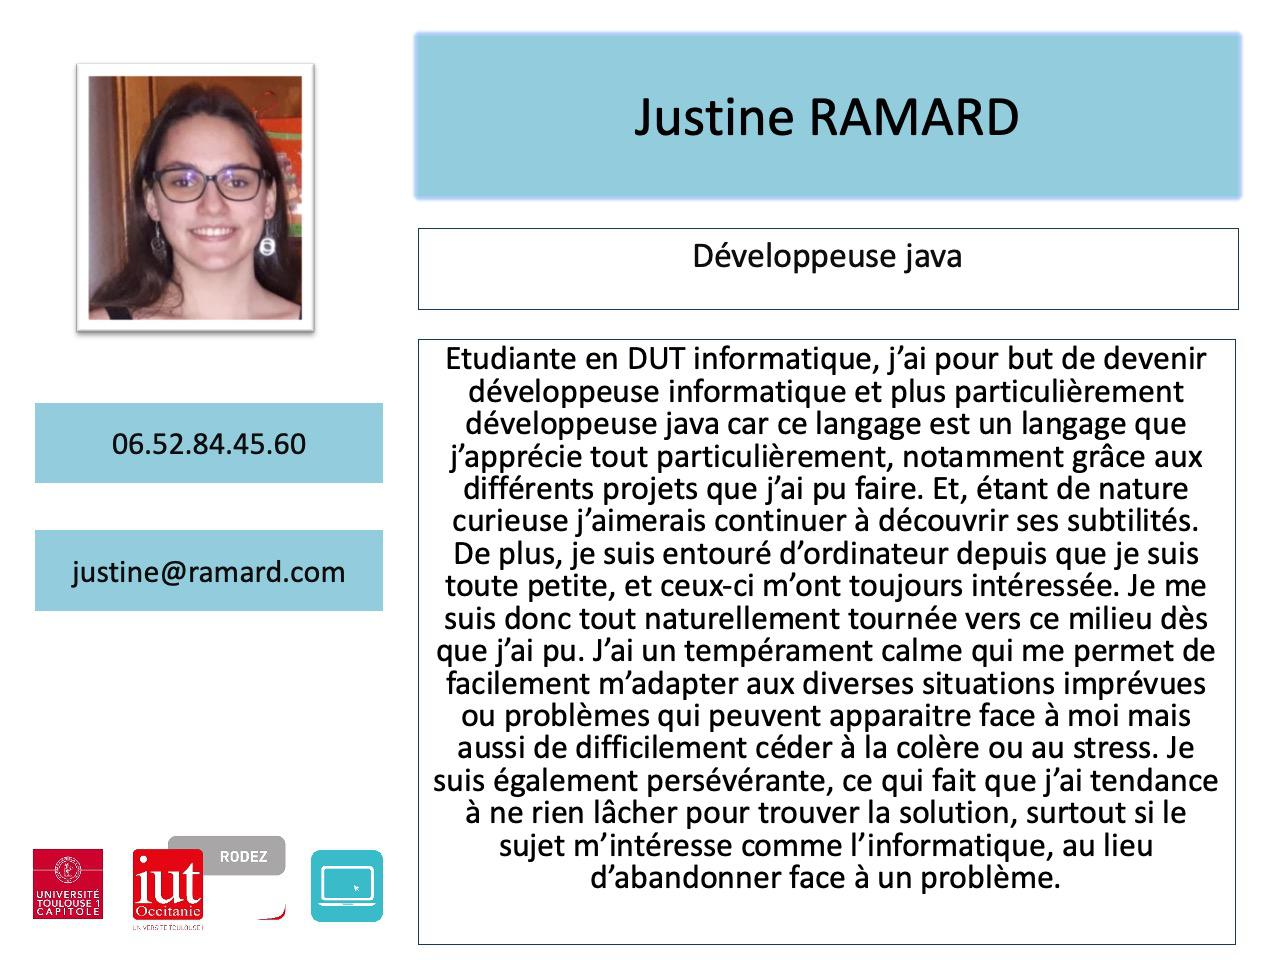 Justine Ramard